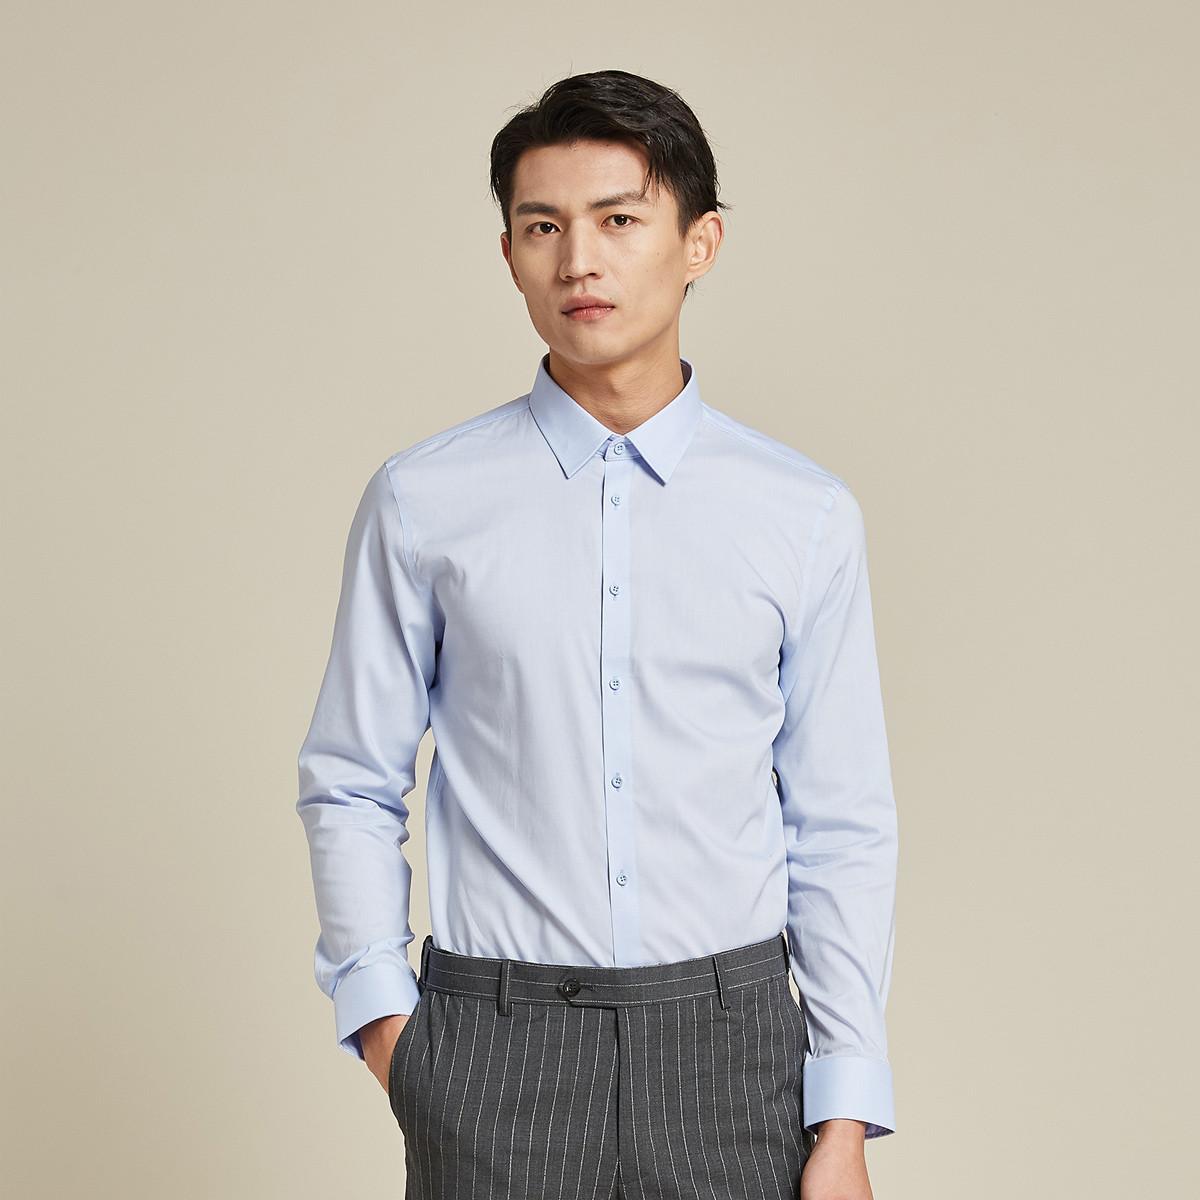 LILANZ 利郎 简约风格商务修身正统长袖衬衫